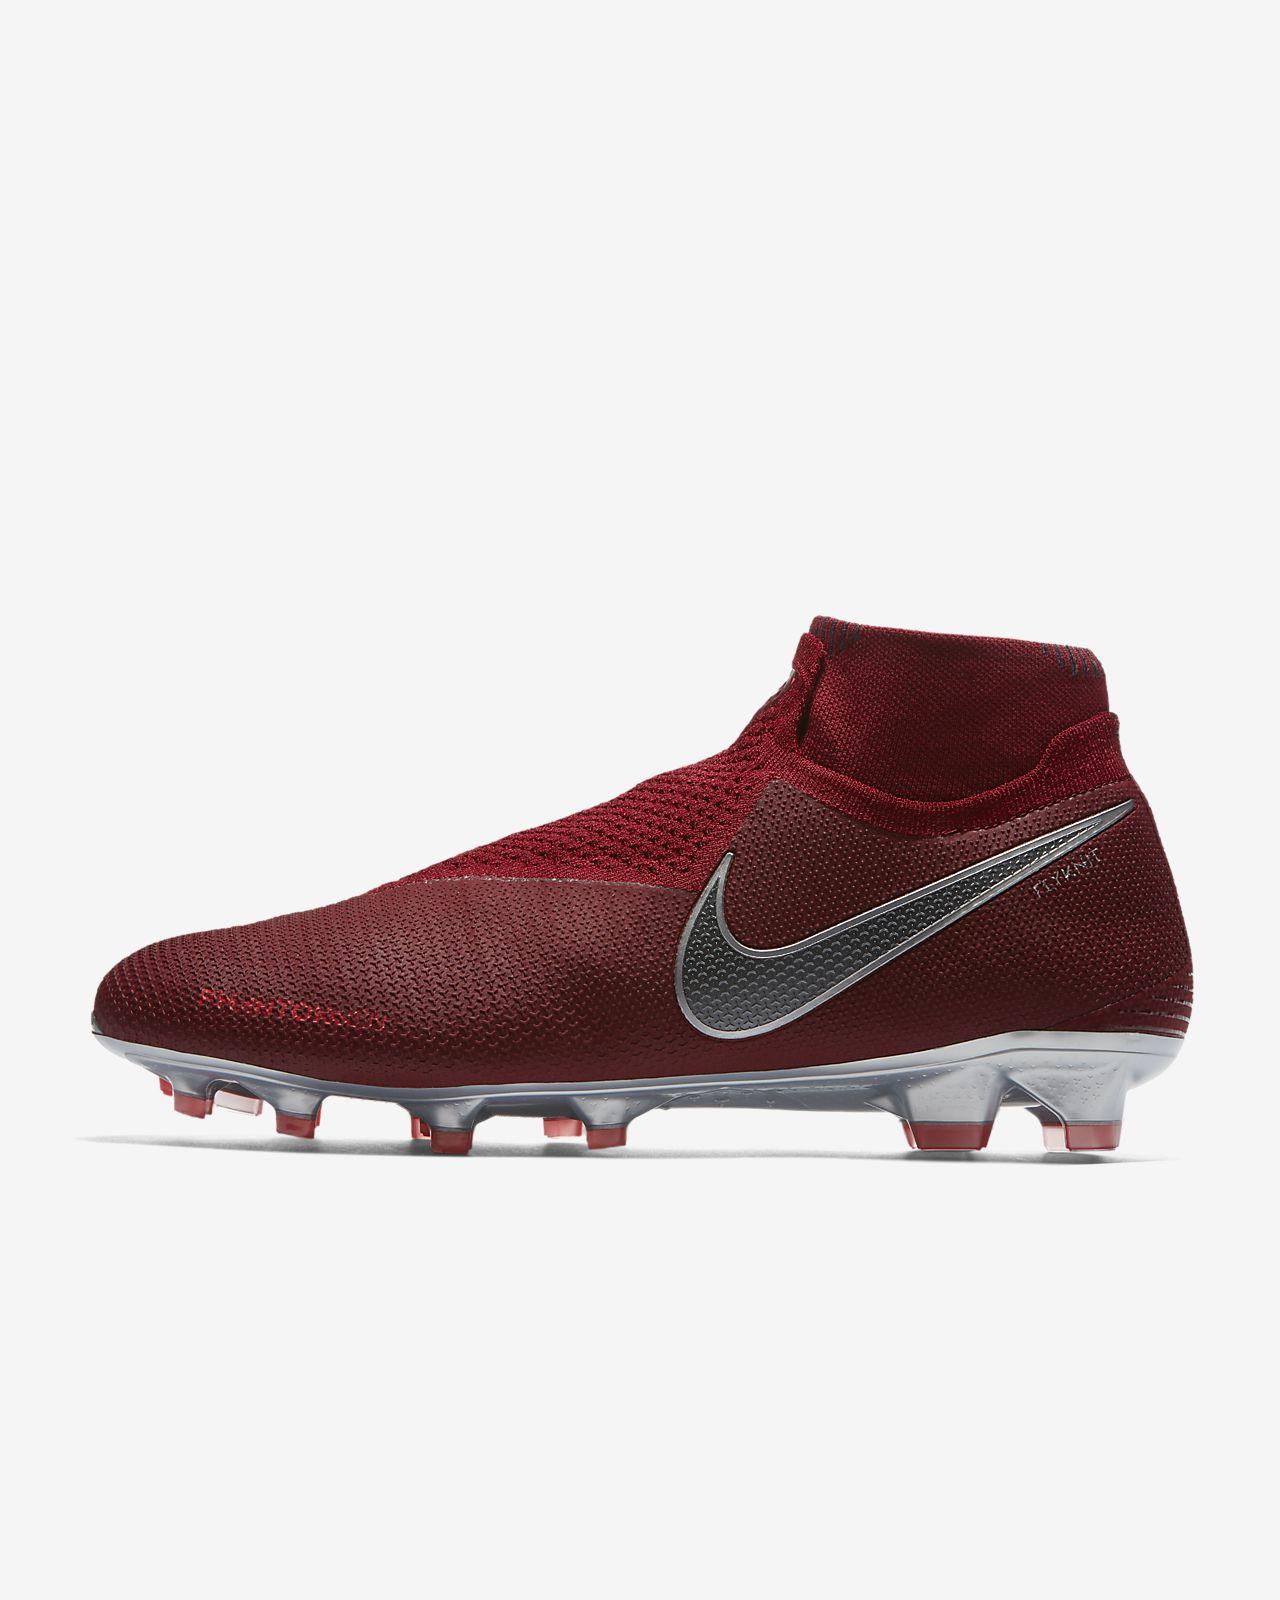 football à sec Chaussure de Nike crampons pour xwUSPUTq Phantom terrain qqBIF